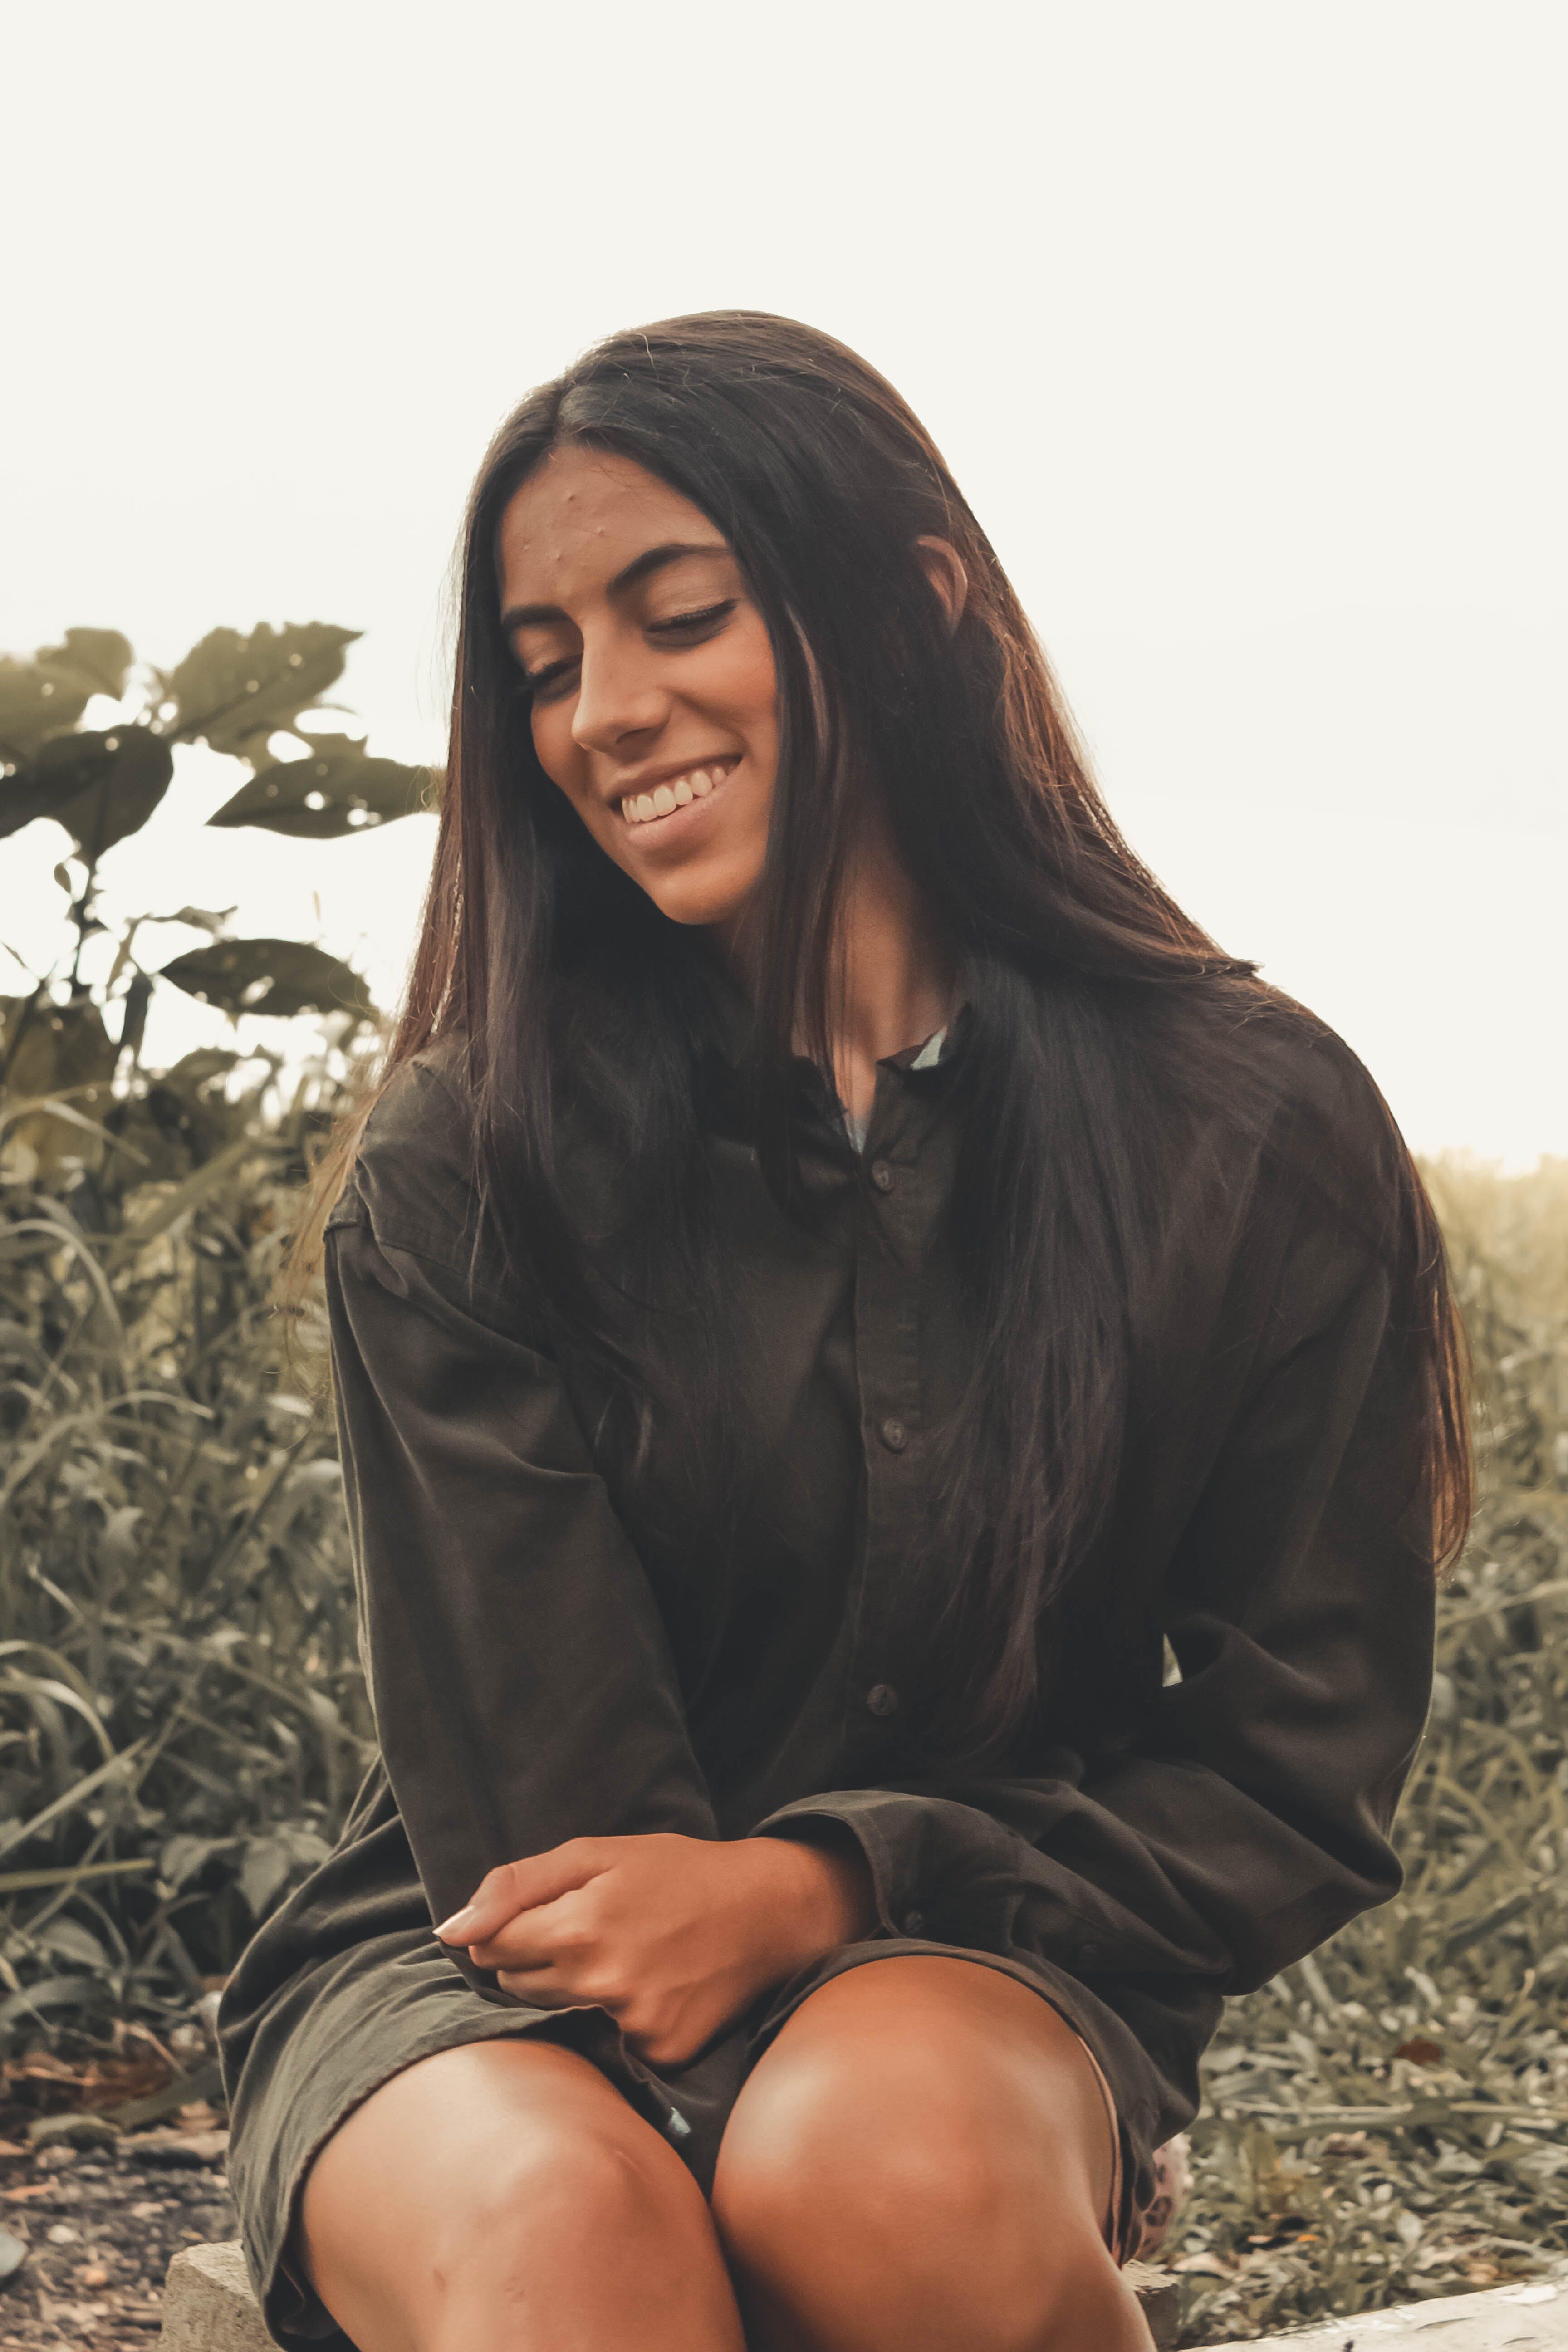 Woman Smiling Near Bushes